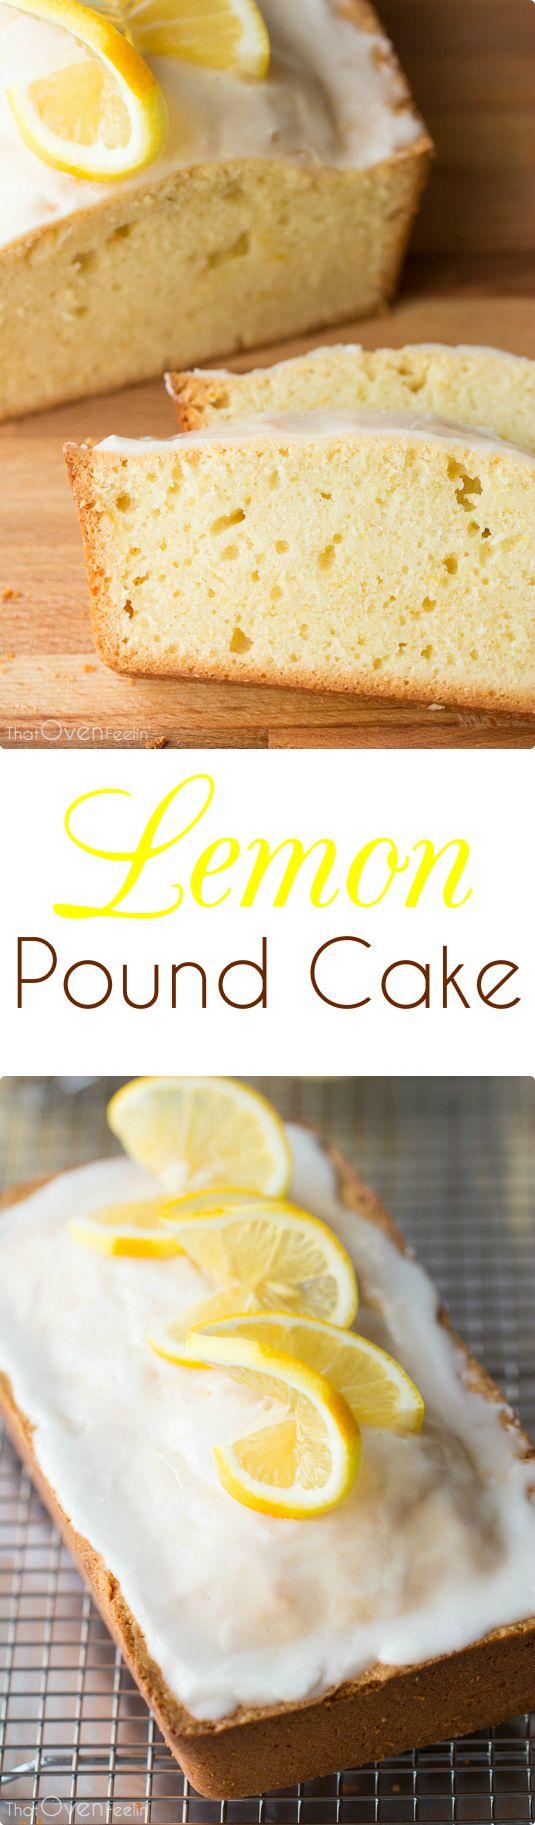 Lemon Pound Cake with a Tangy Lemon Icing